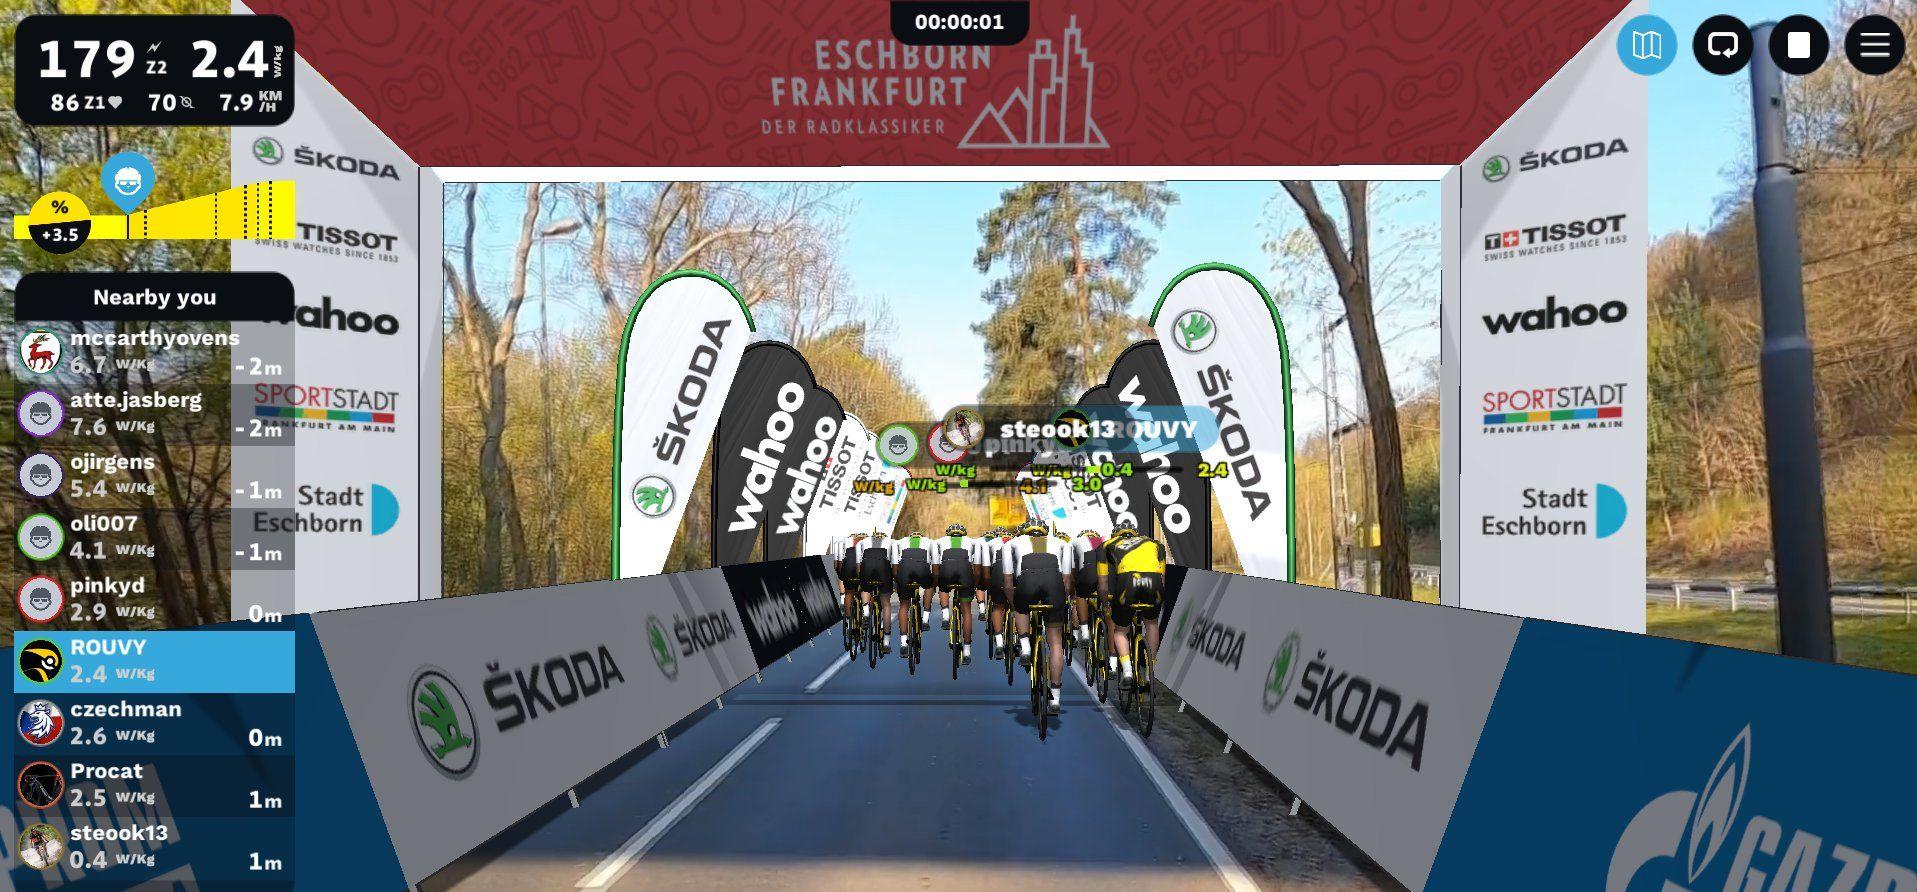 Virtual Rad-Bundesliga by The German Classic ESCHBORN -FRANKFURT on ROUVY on May 1st